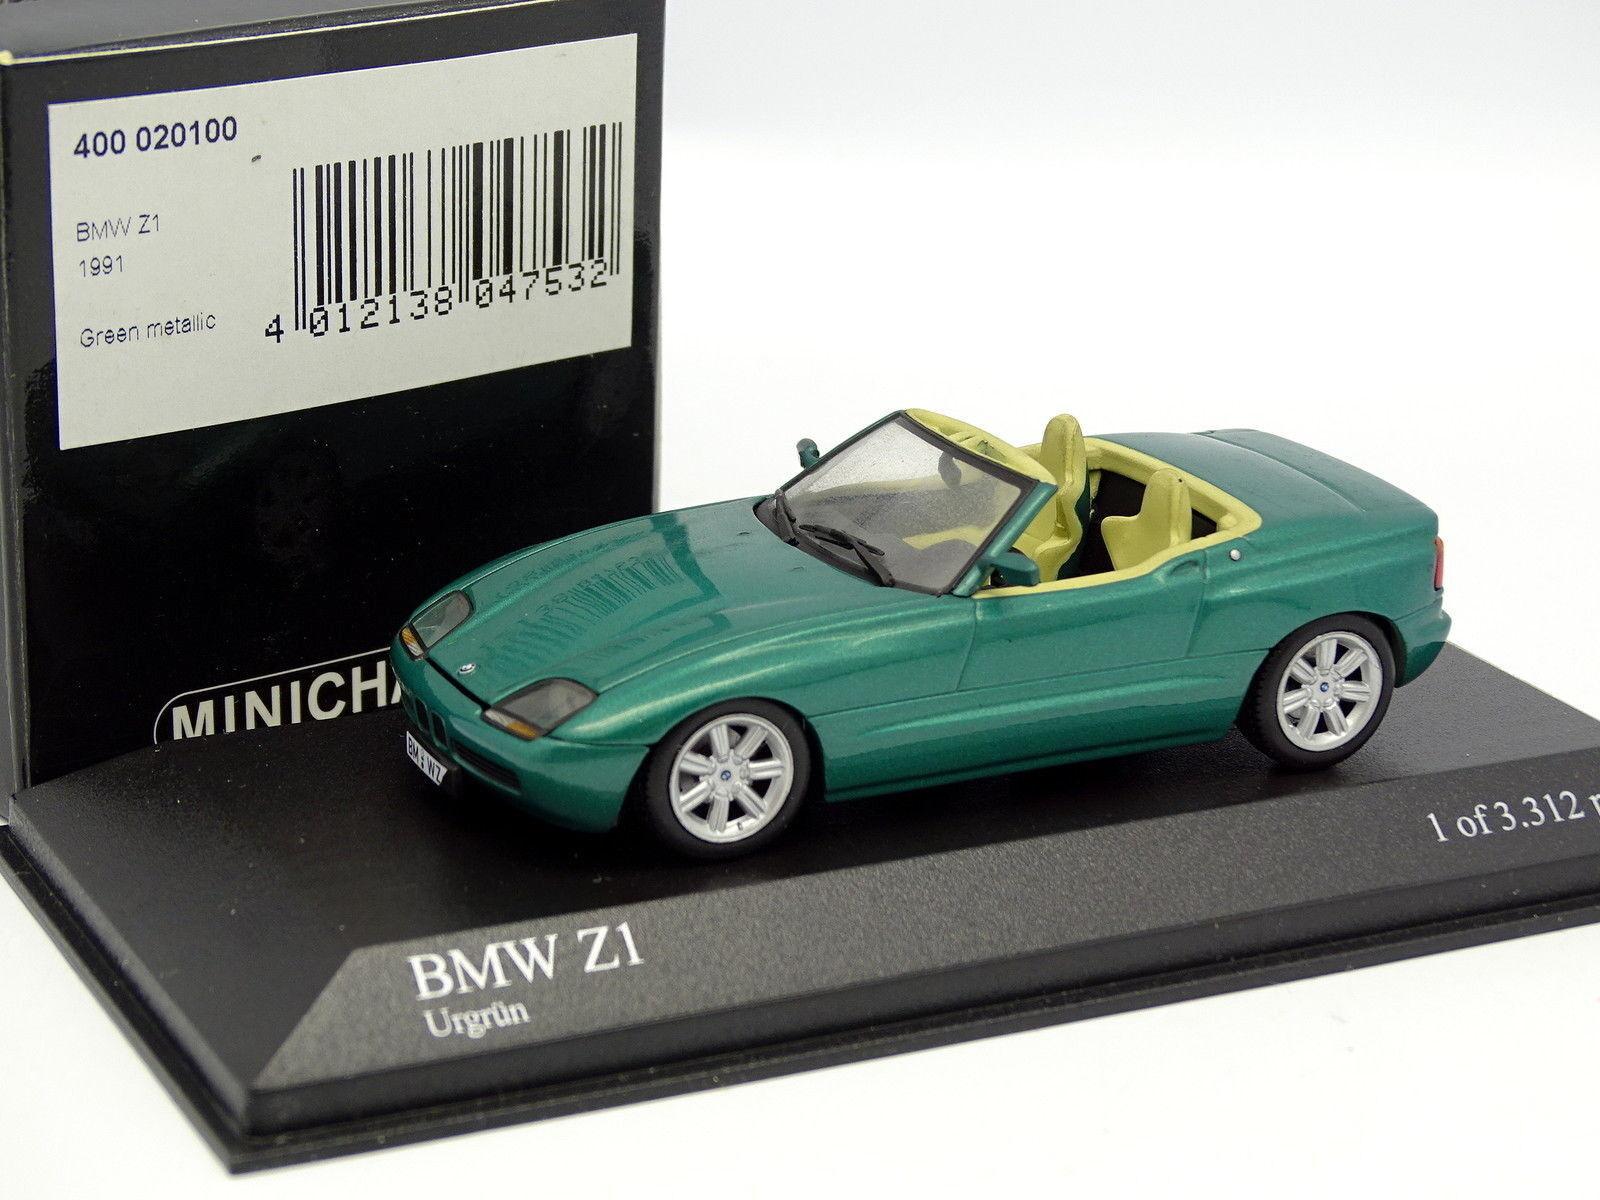 Minichamps 1 43 - bmw z1 1991 green